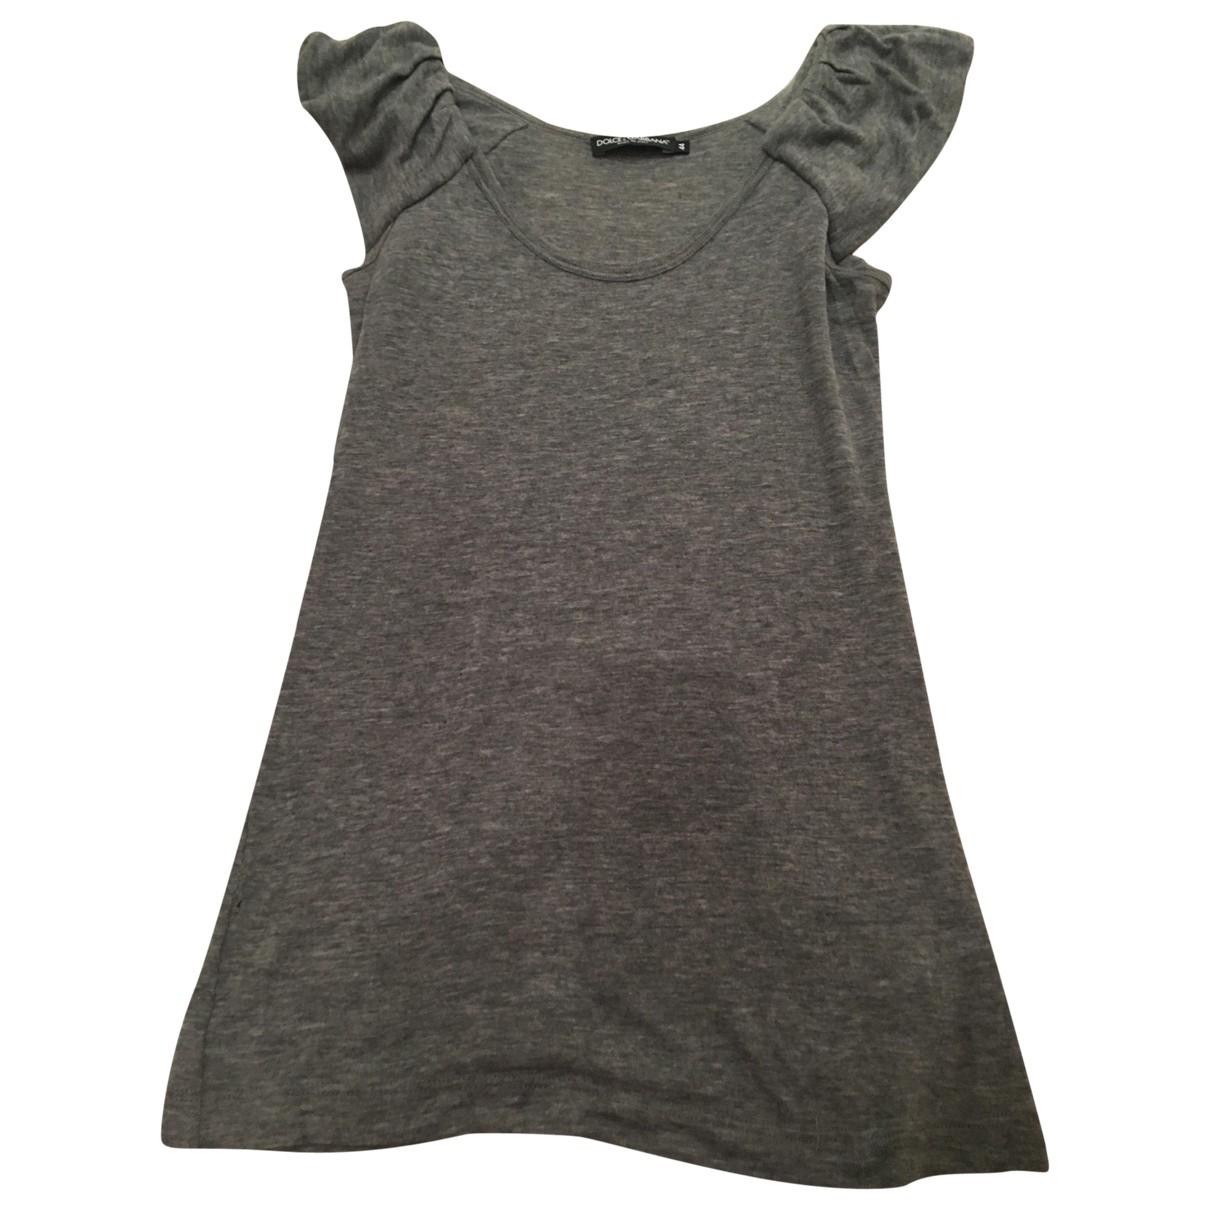 Dolce & Gabbana \N Grey Cashmere  top for Women 44 IT